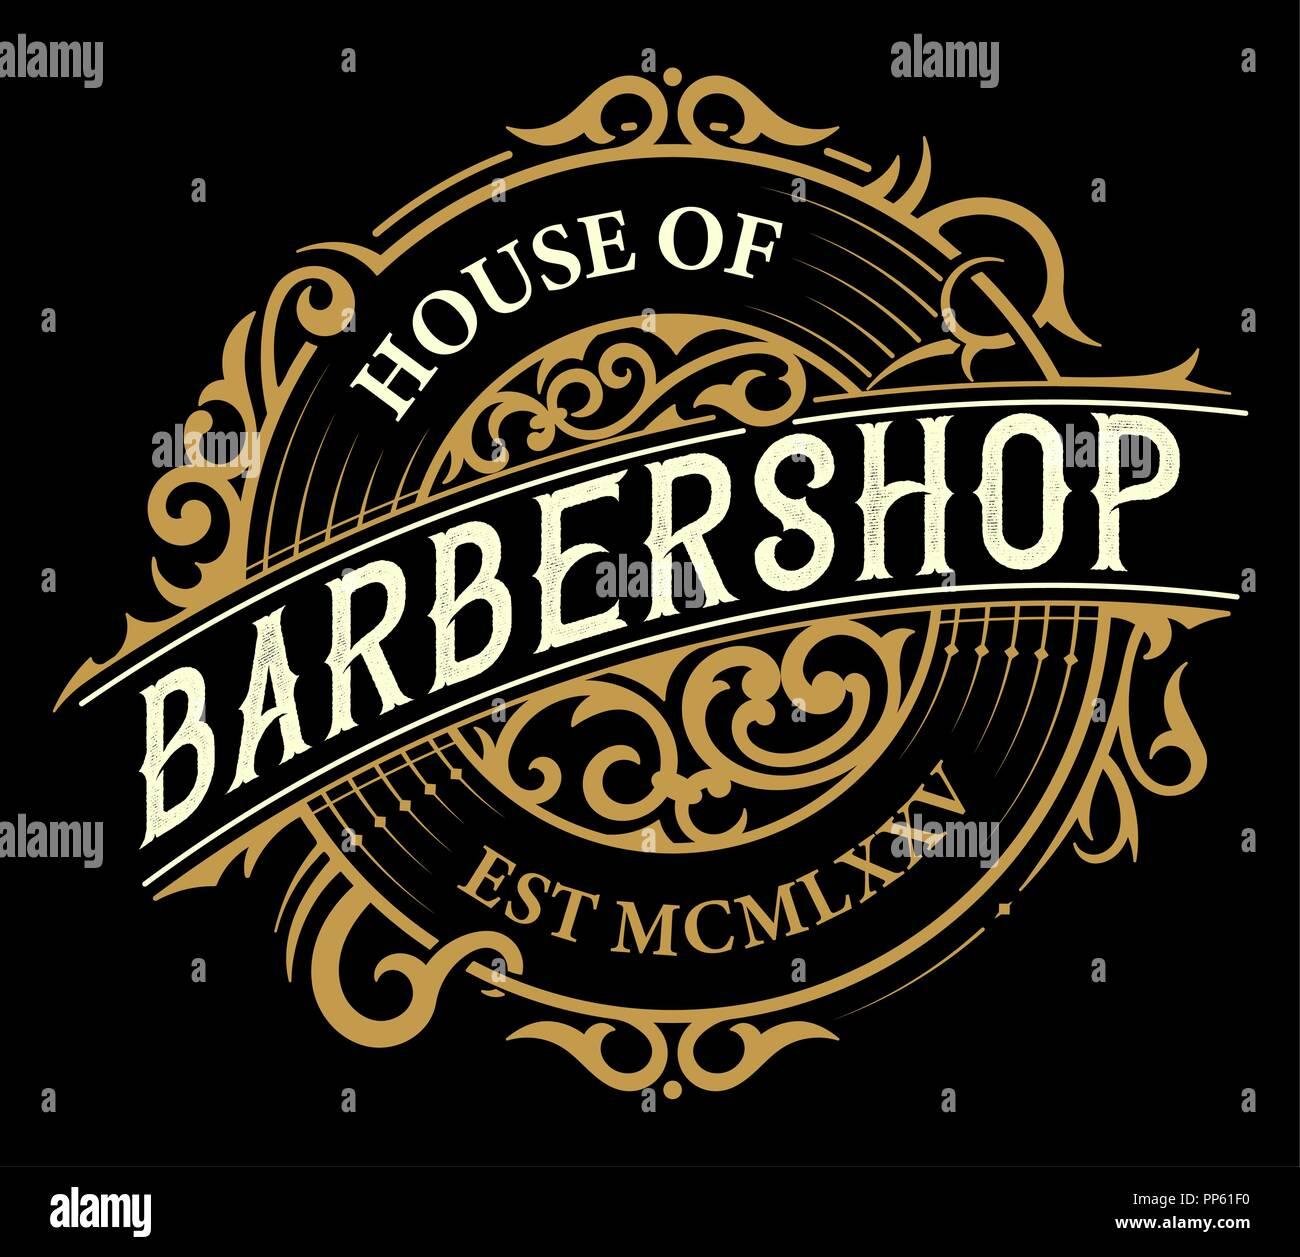 vintage barbershop logo stock